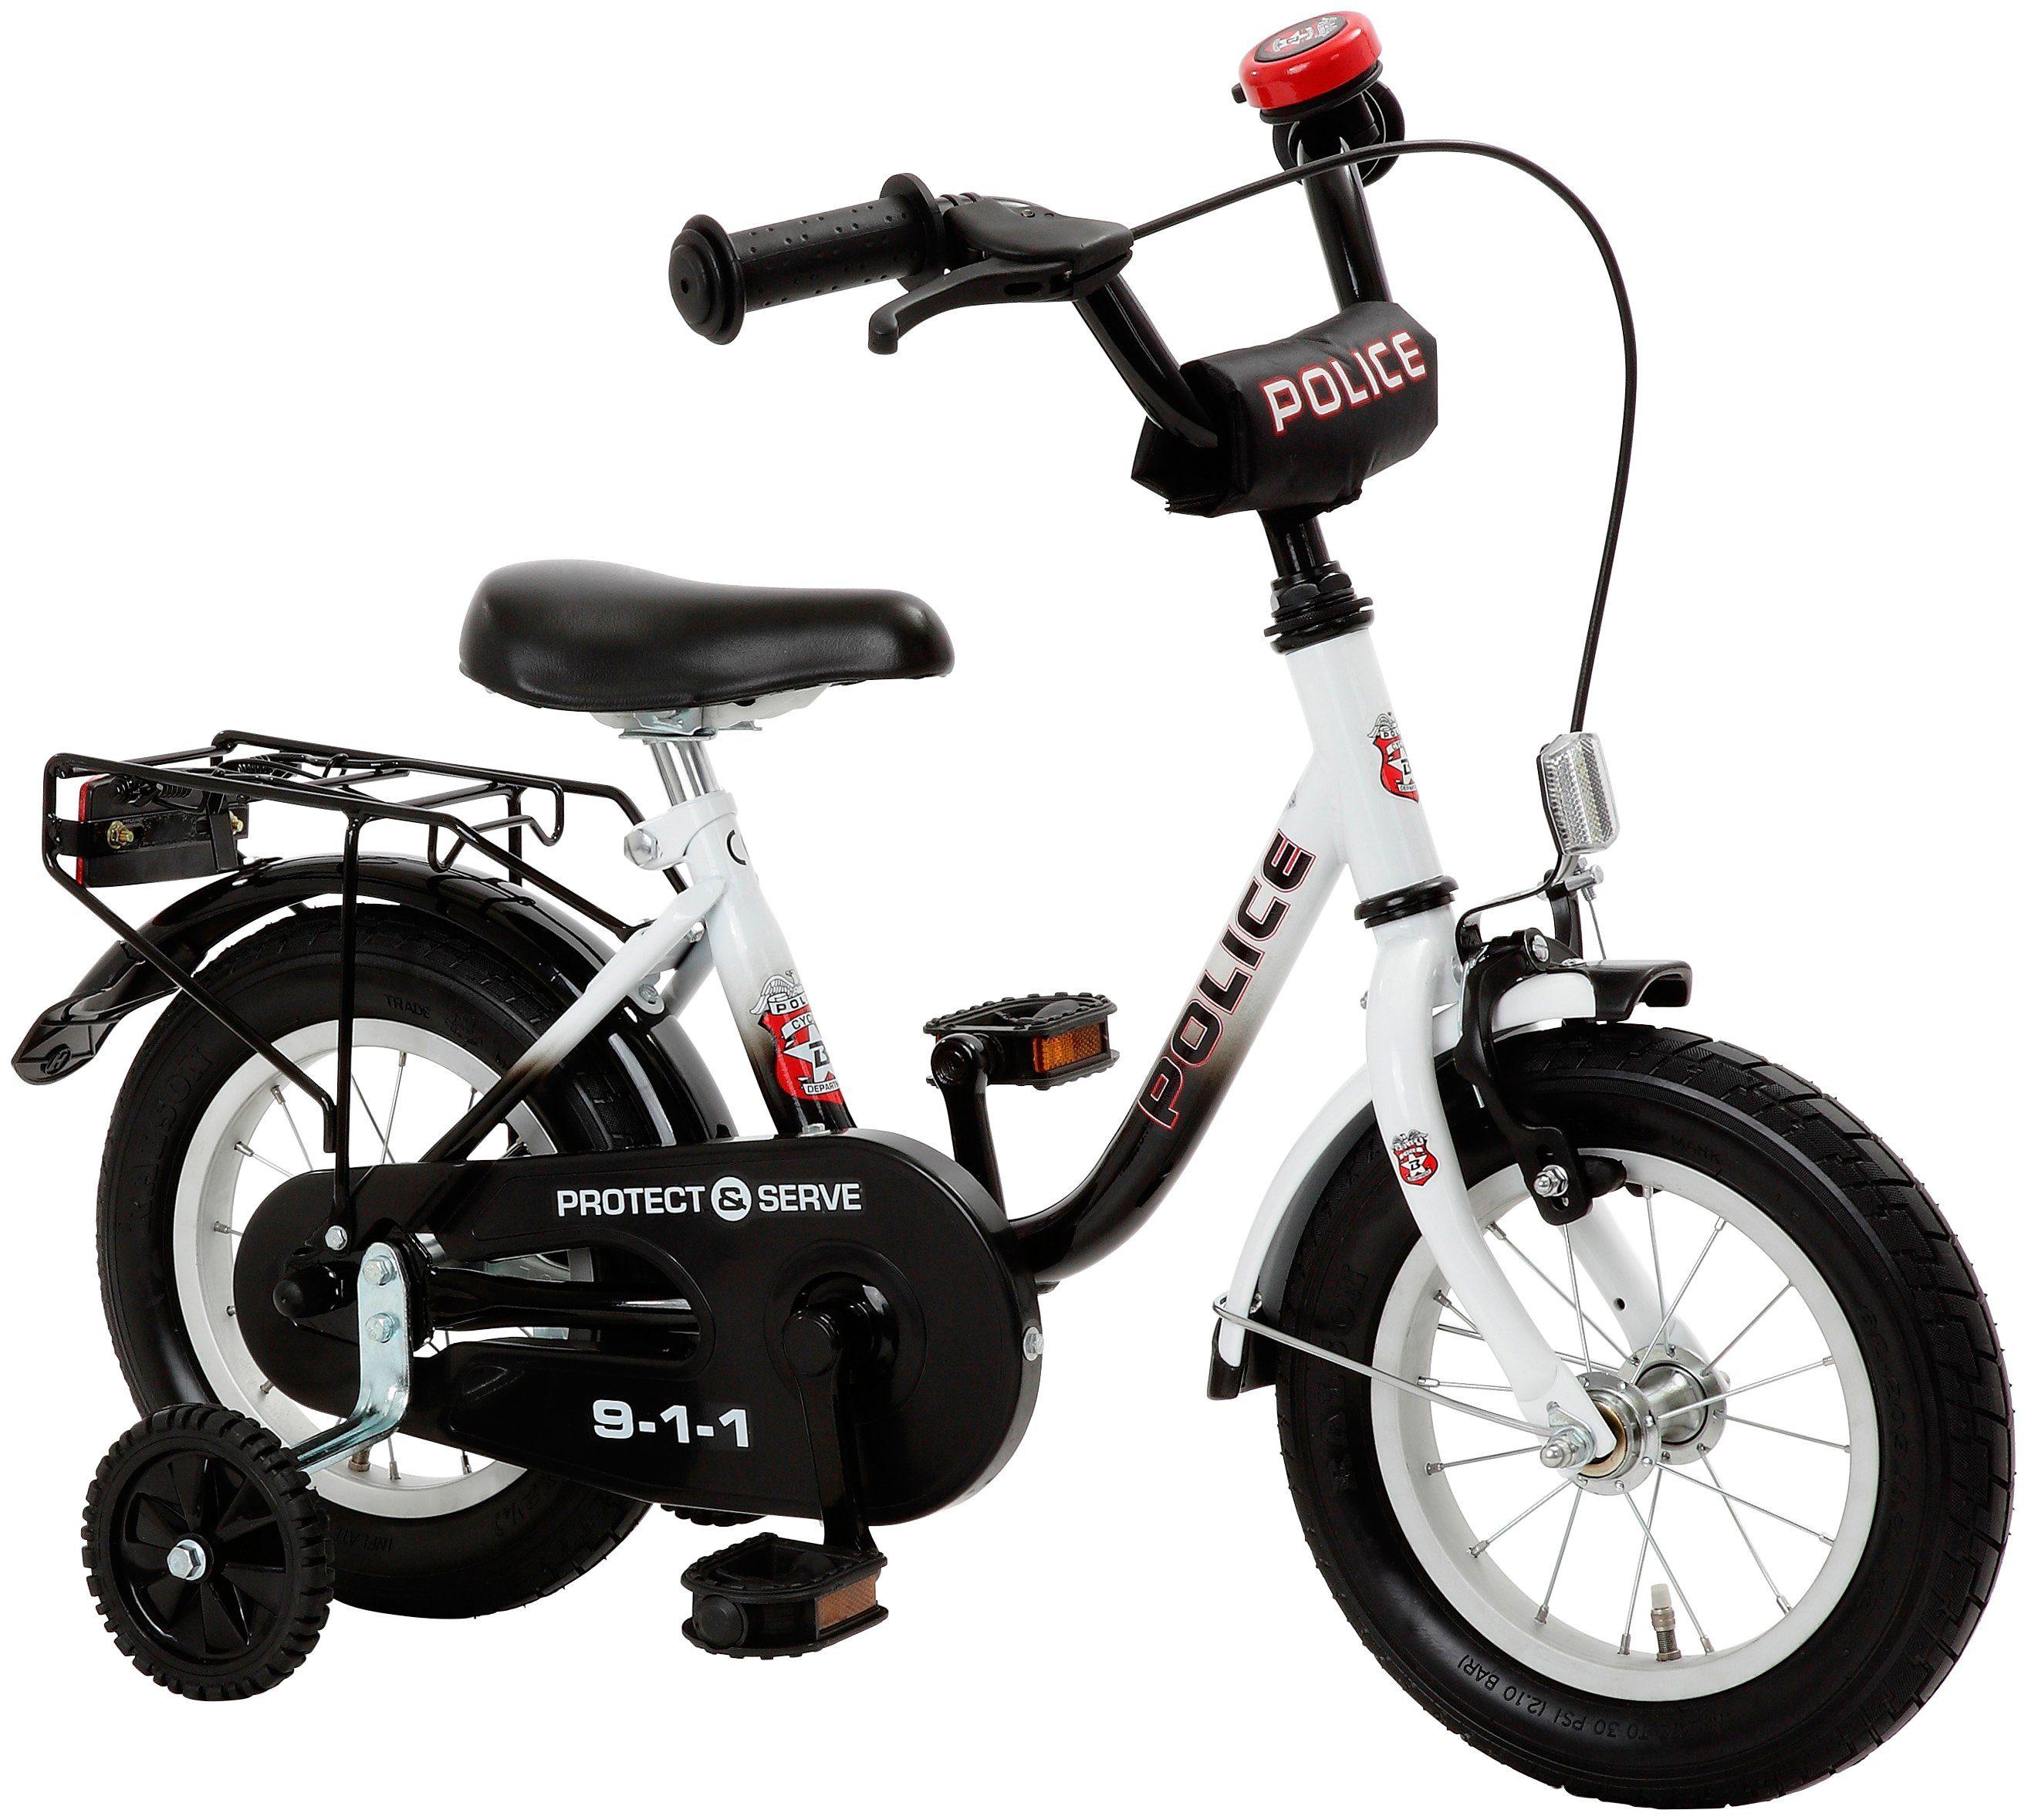 Cycles4Kids Kinderfahrrad »Police, 31,75 cm (12,5 Zoll)«